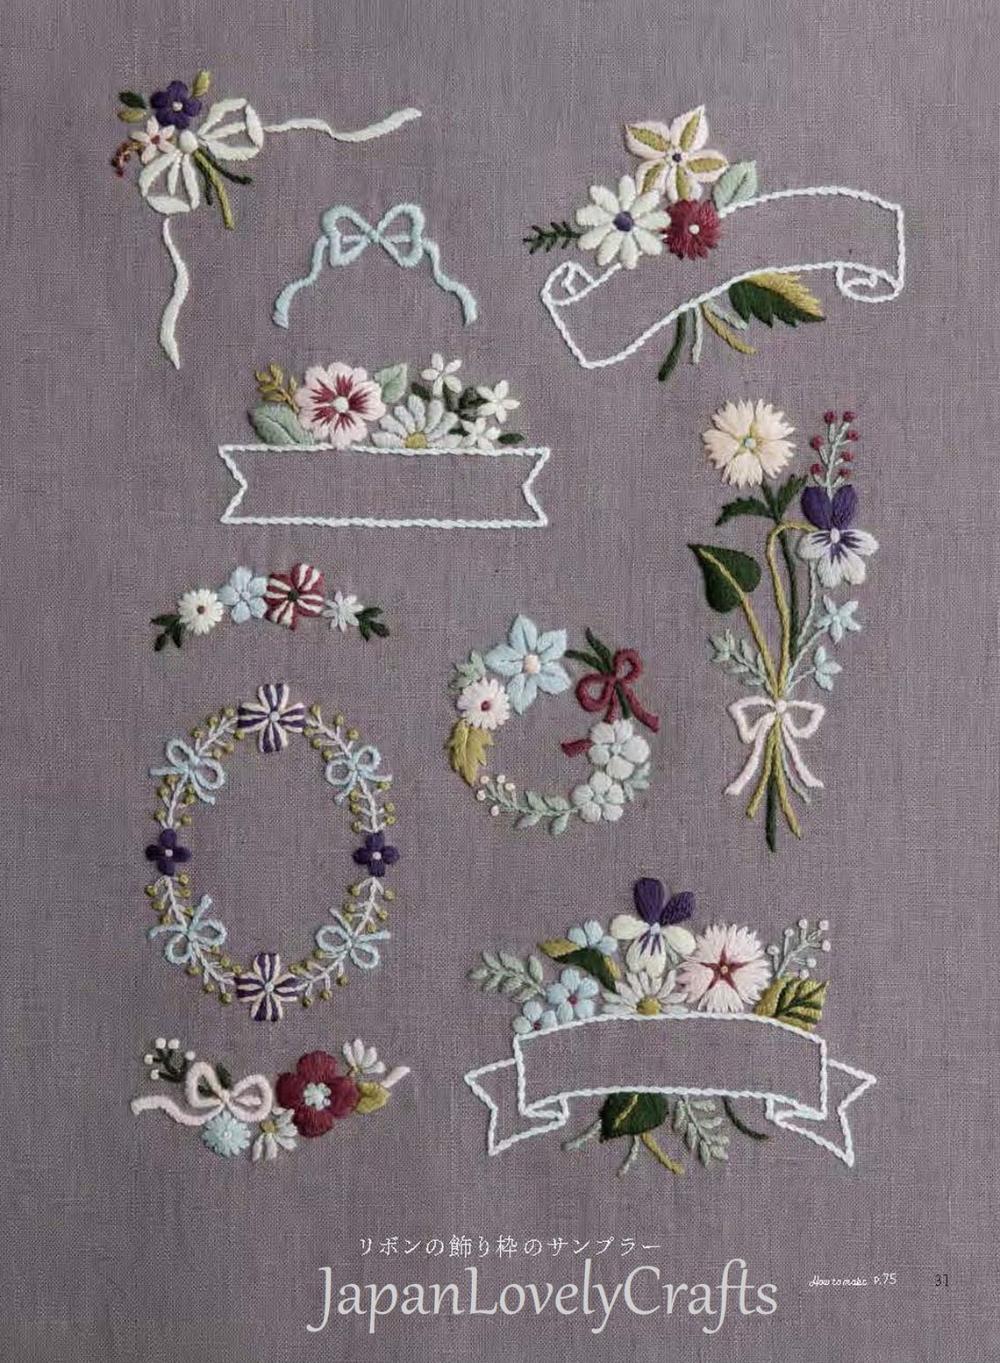 Cute Flowers & animal embroidery patterns, Japanese hand Embroidery Pattern book for Japanese style zakka, kawaii embroidered sampler / gift